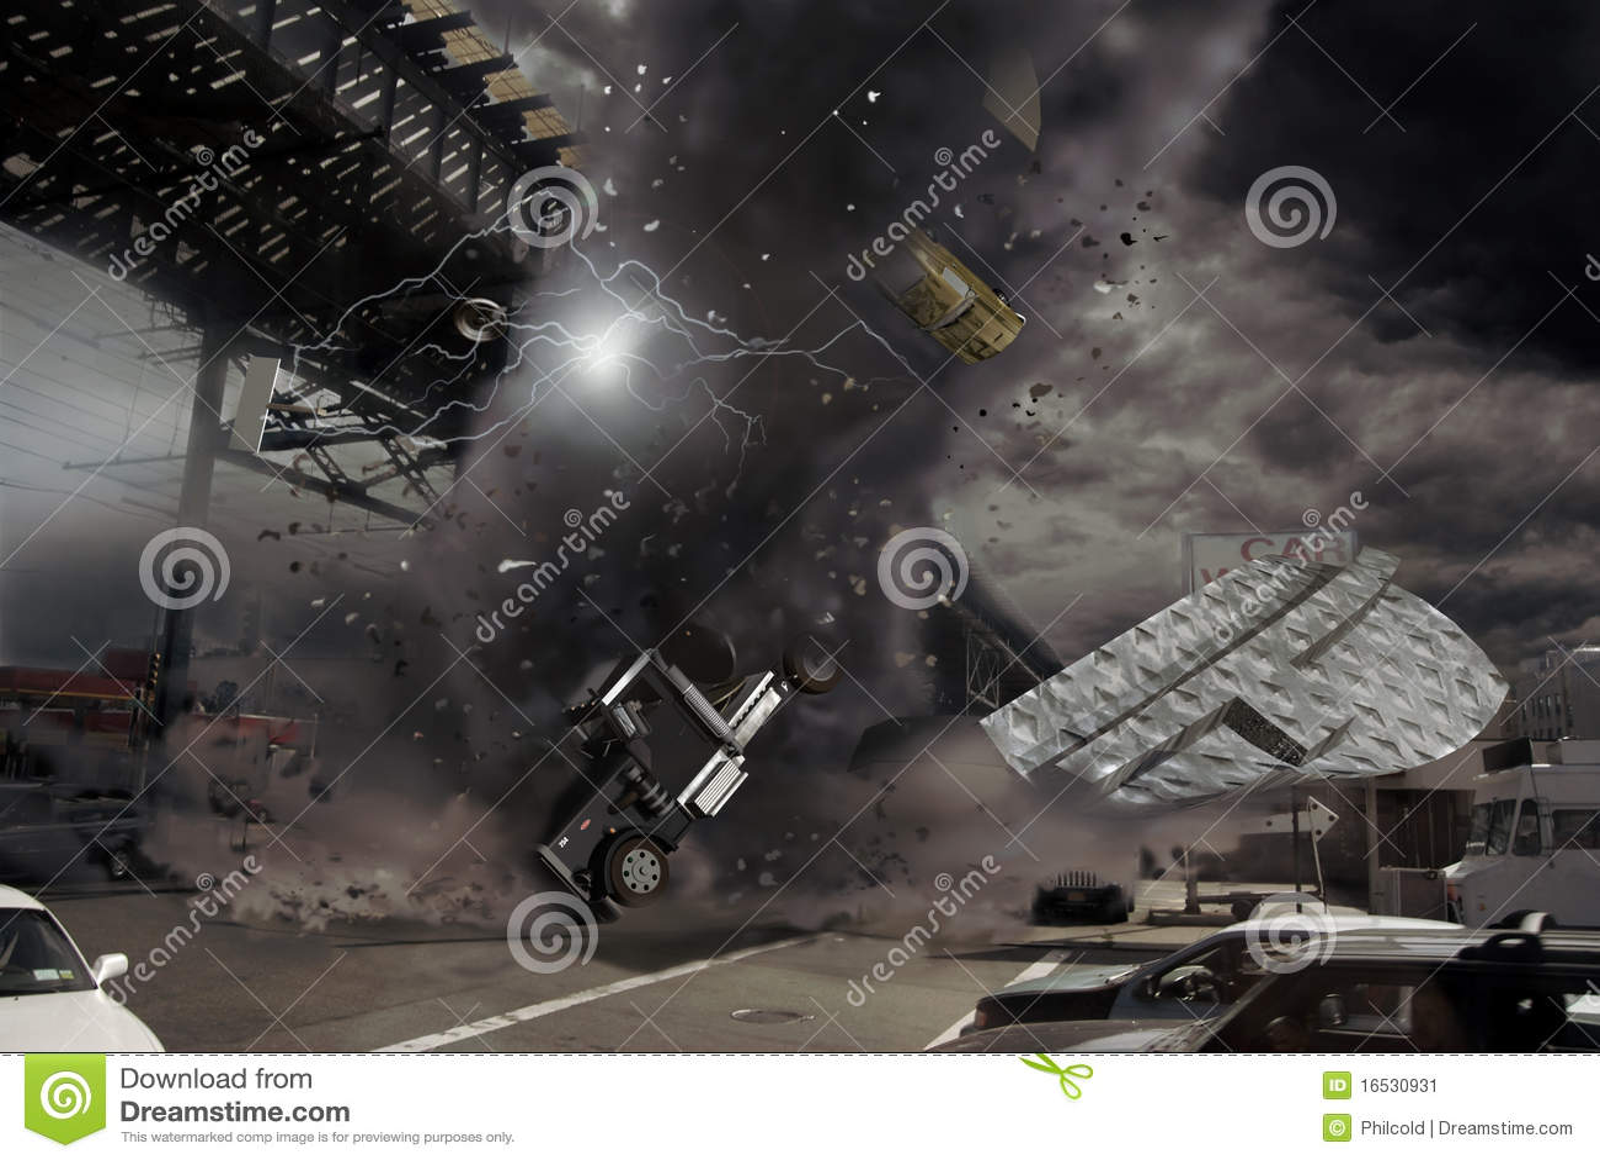 Tornado in the city